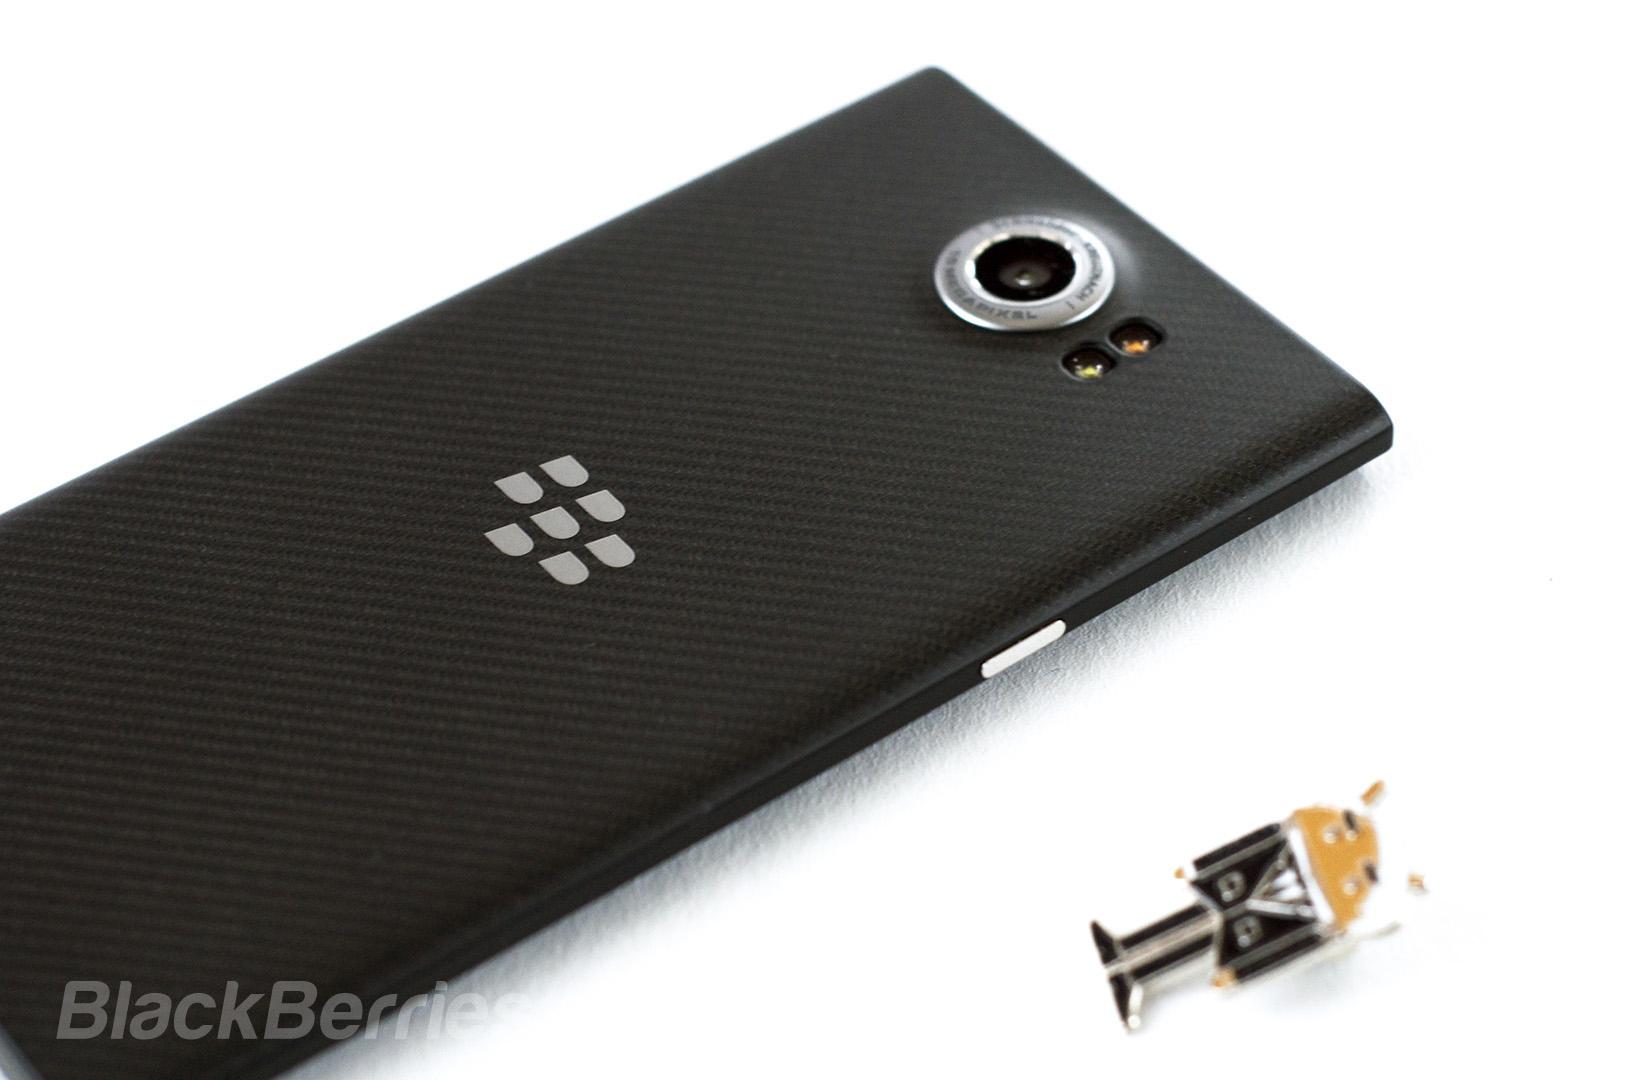 BlackBerry-Priv-Review-132